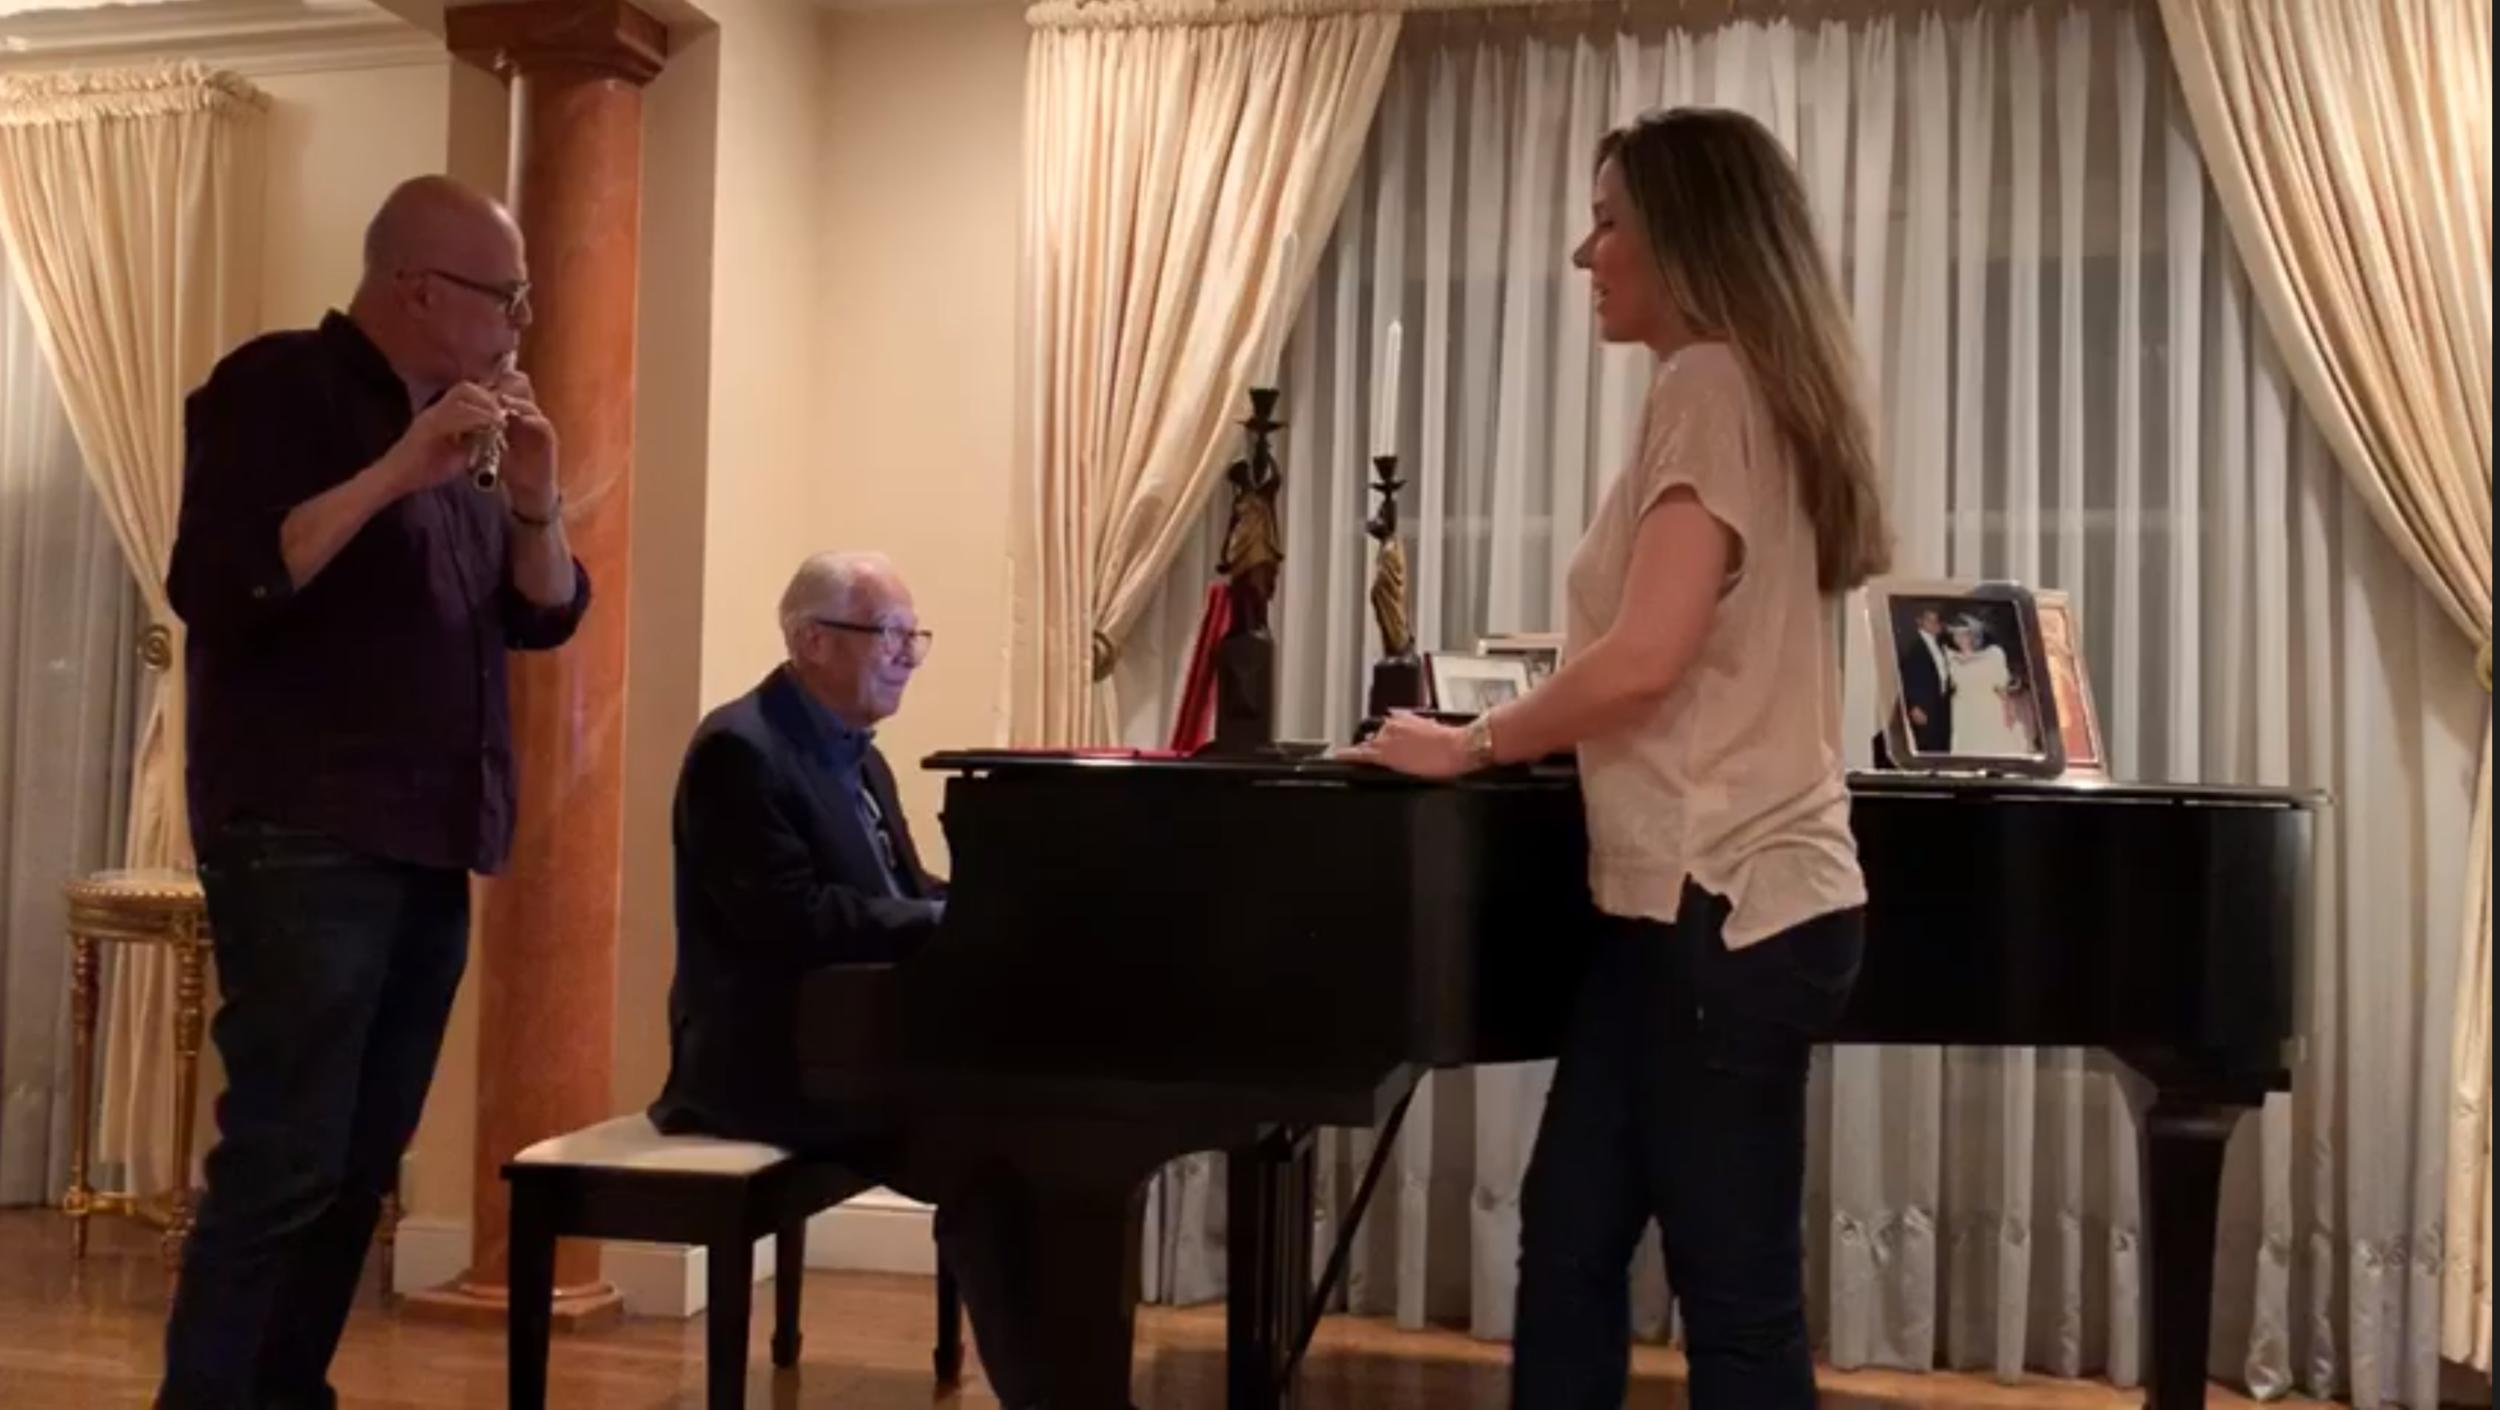 Maestro Jorge Calandrelli, Bob Sheppard and Maria jamming at Fernando Gelbard's residence, BH 2019